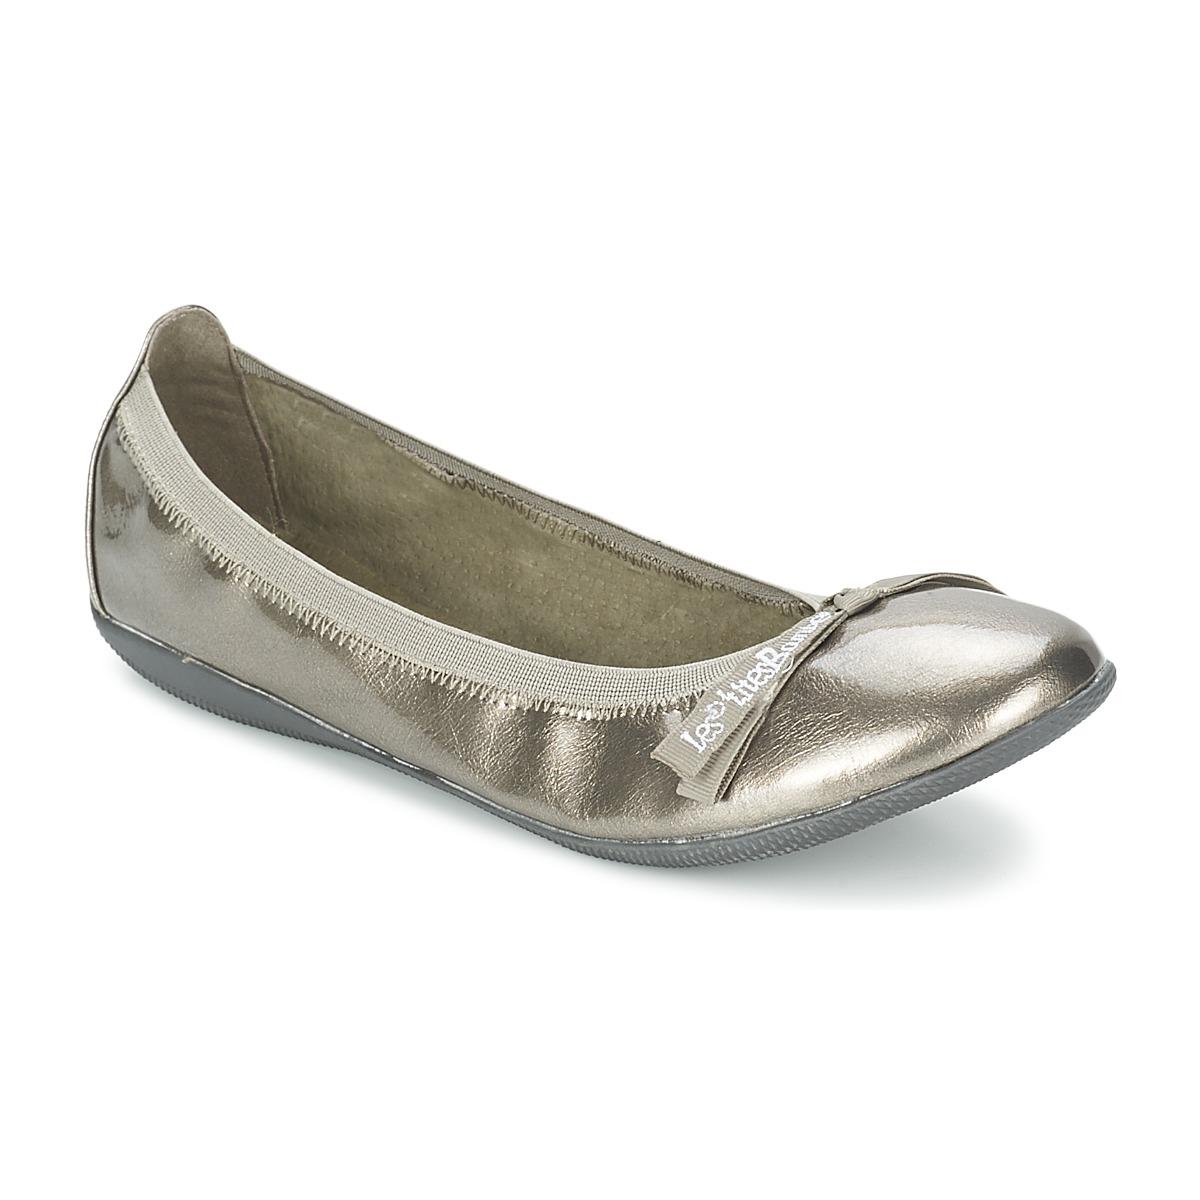 91e4fb299b2d Αρχίζεις και κοιτάς τις βιτρίνες πια για παπούτσια πόλης και για το  καλοκαίρι για άνετα πέδιλα. Όμως σιγά-σιγά παυει να σε νοιάζει. Έχεις την  ευκαιρία να ...